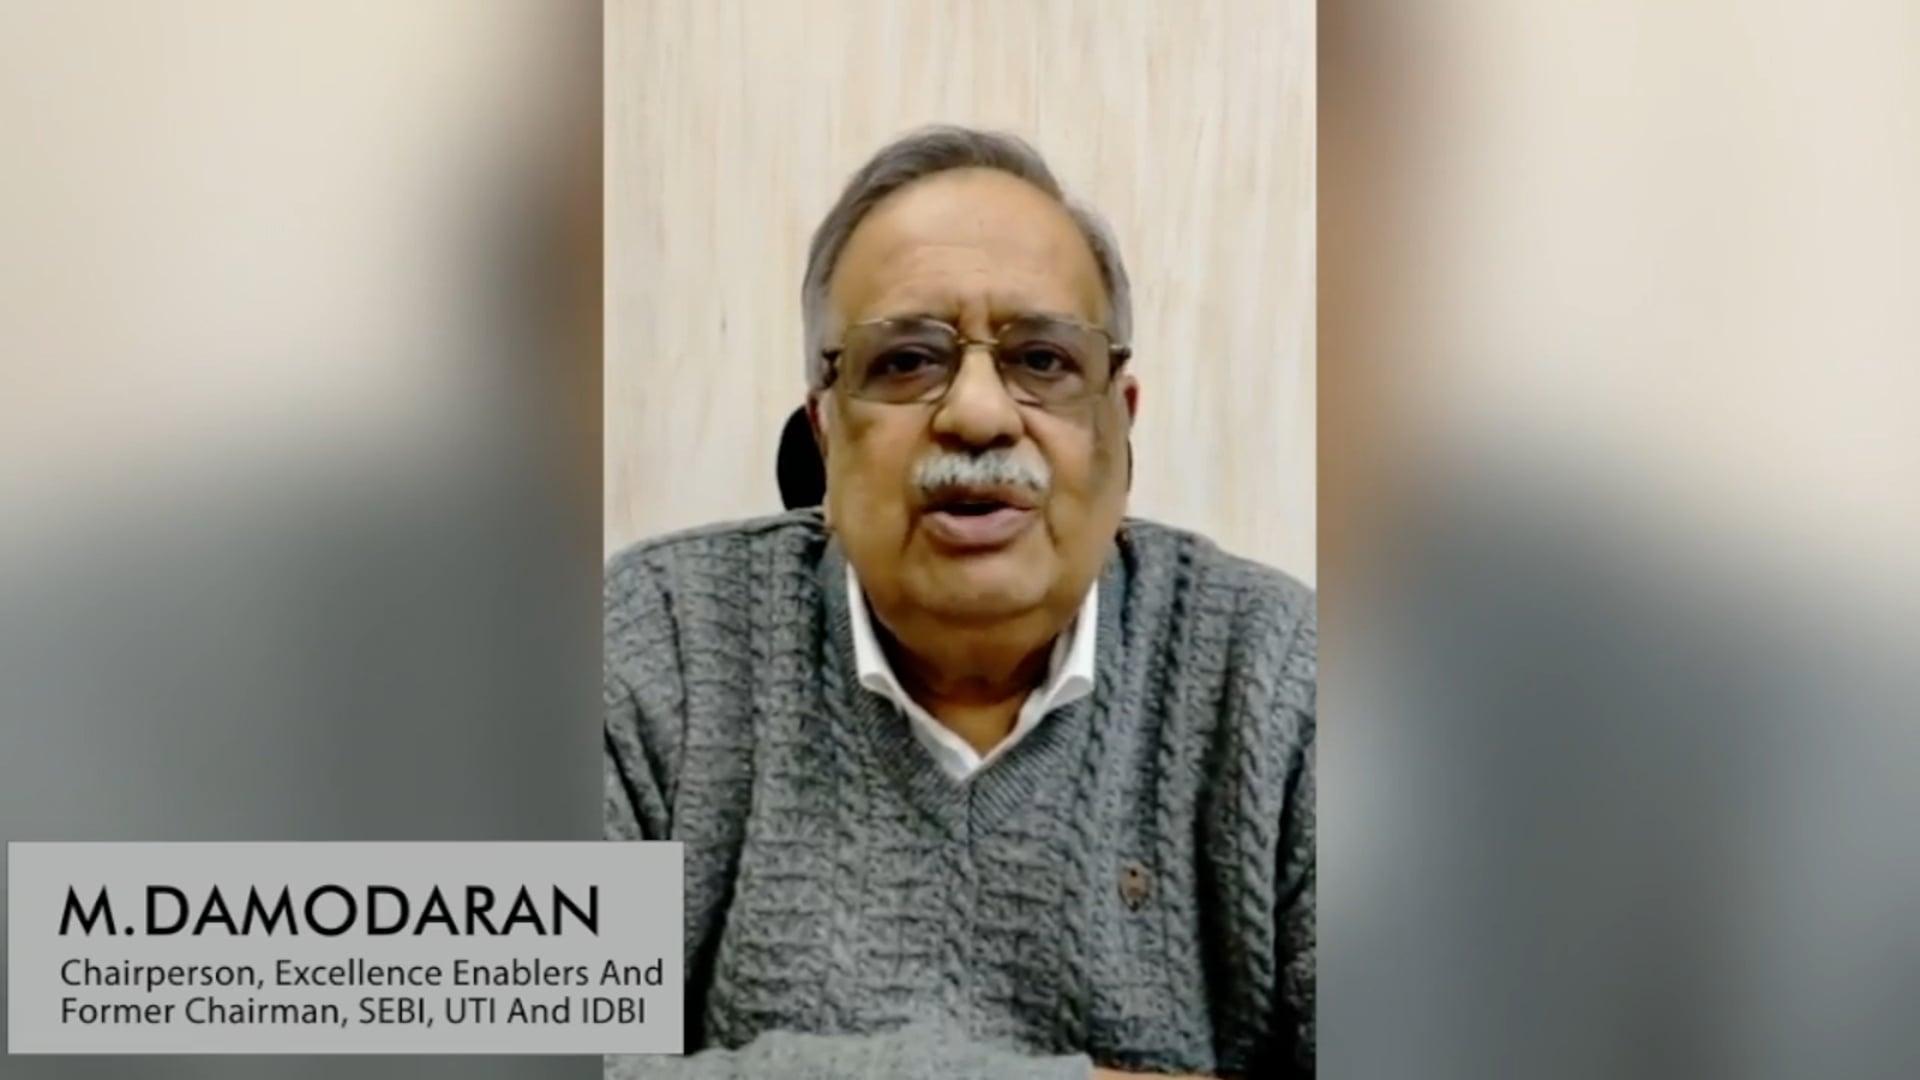 M. Damodaran on 'The Right Choice'